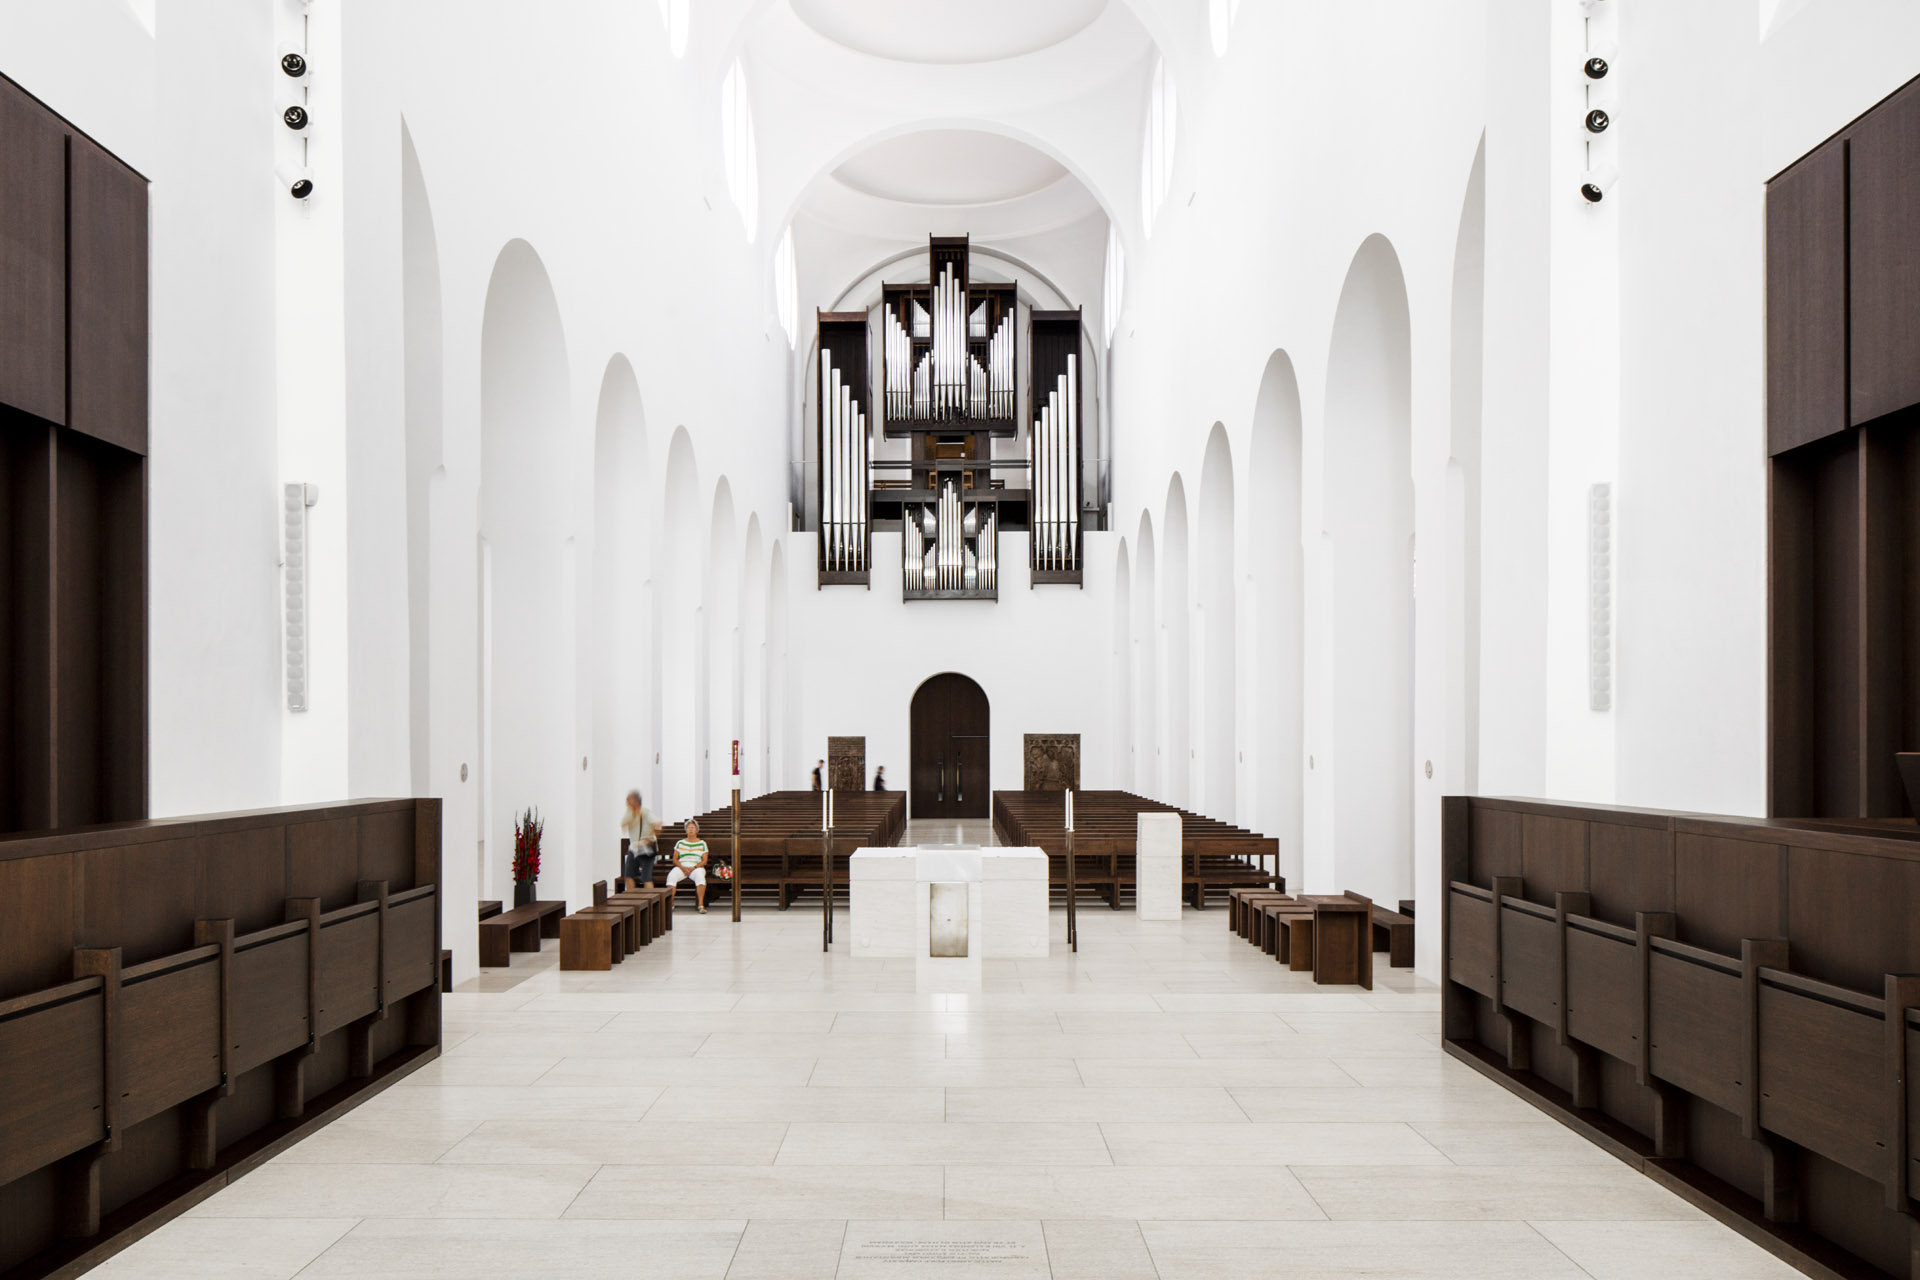 A9A3158 - Moritzkirche